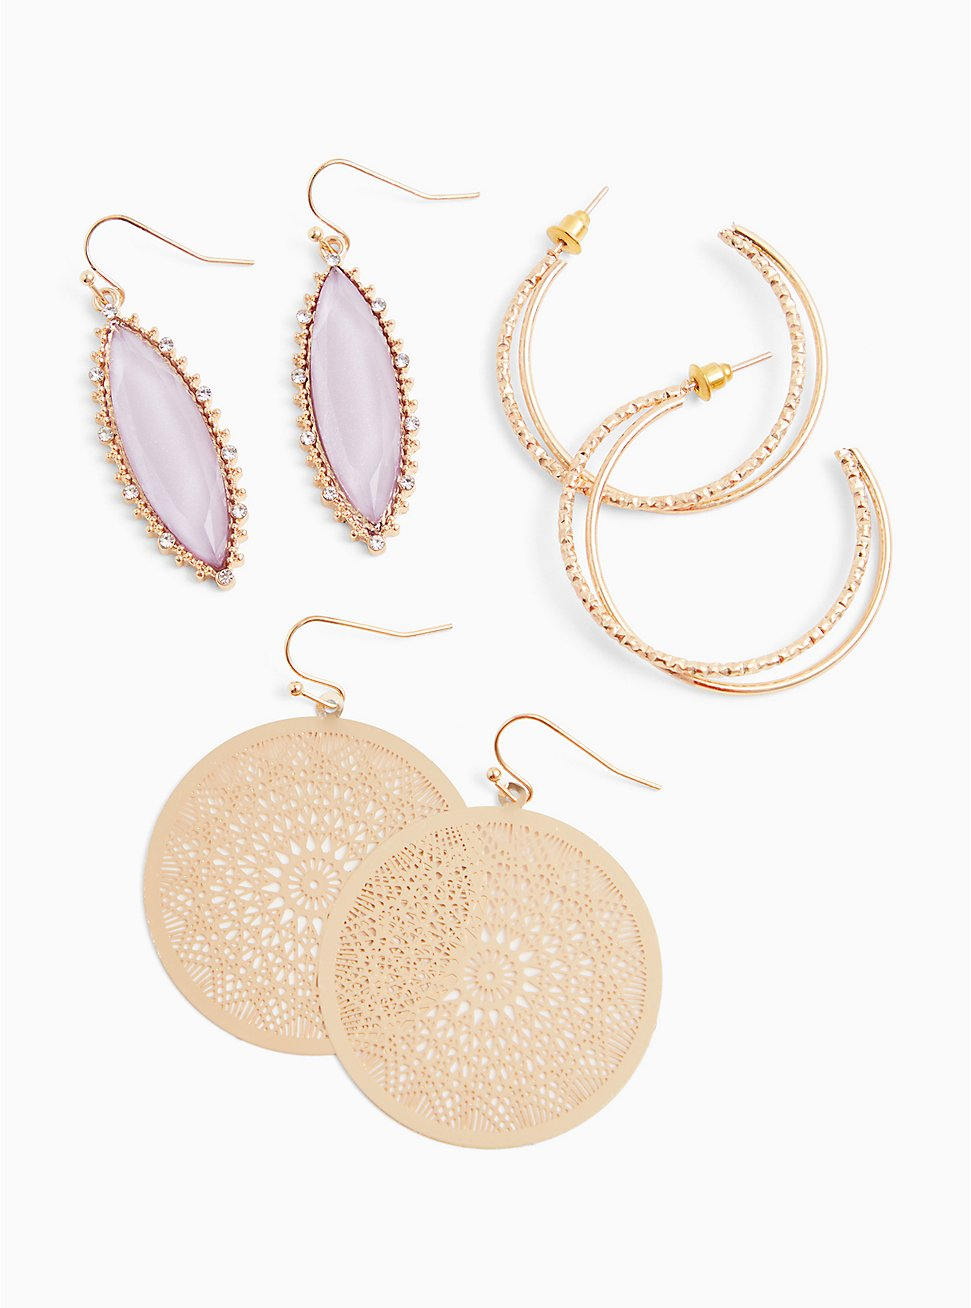 Gold-Tone & Lilac Purple Drop Earrings Set - Set of 3, , hi-res